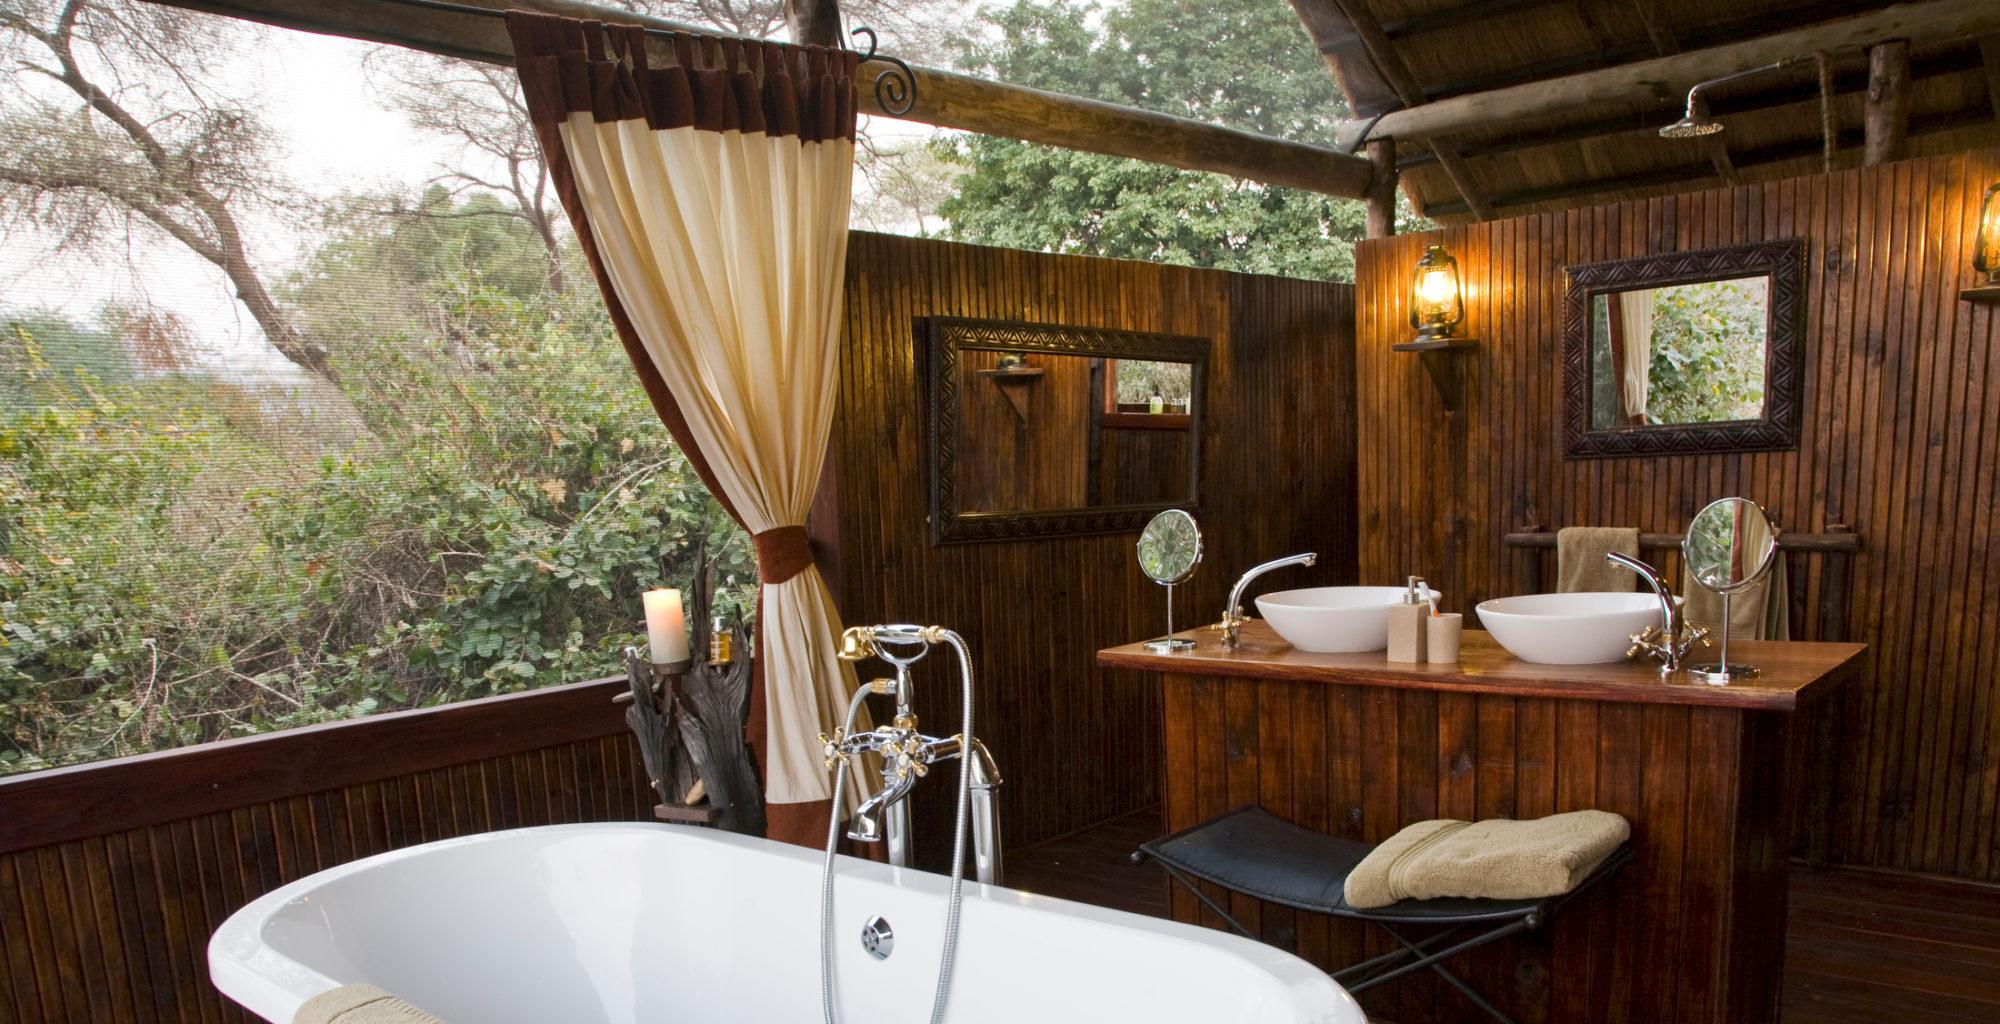 CHIAWA CAMP Zambia Bathroom